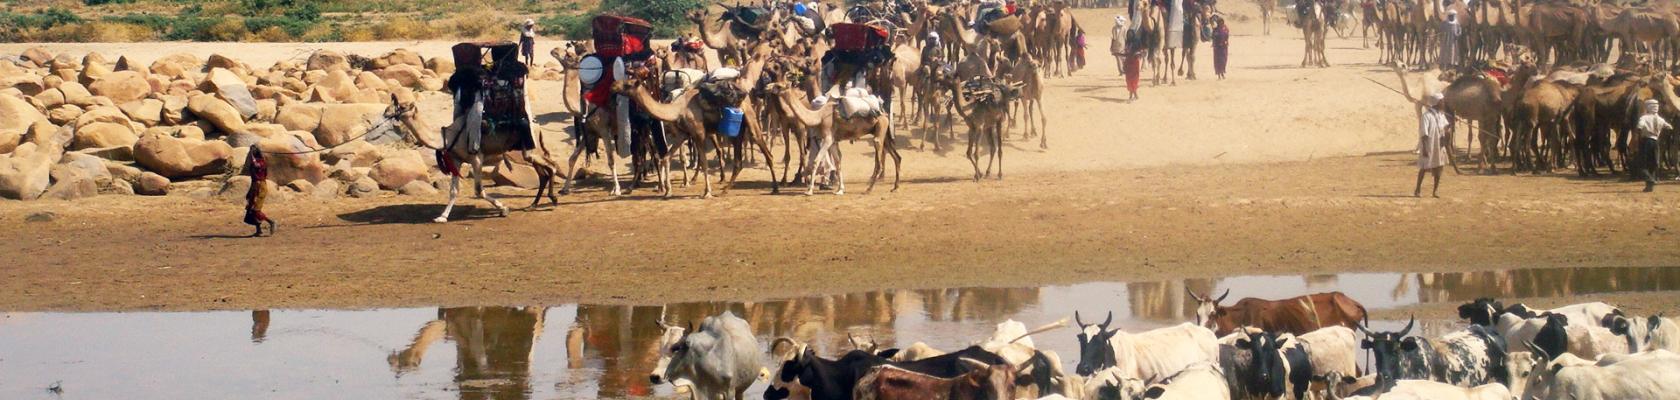 Tchad transhumance bétail